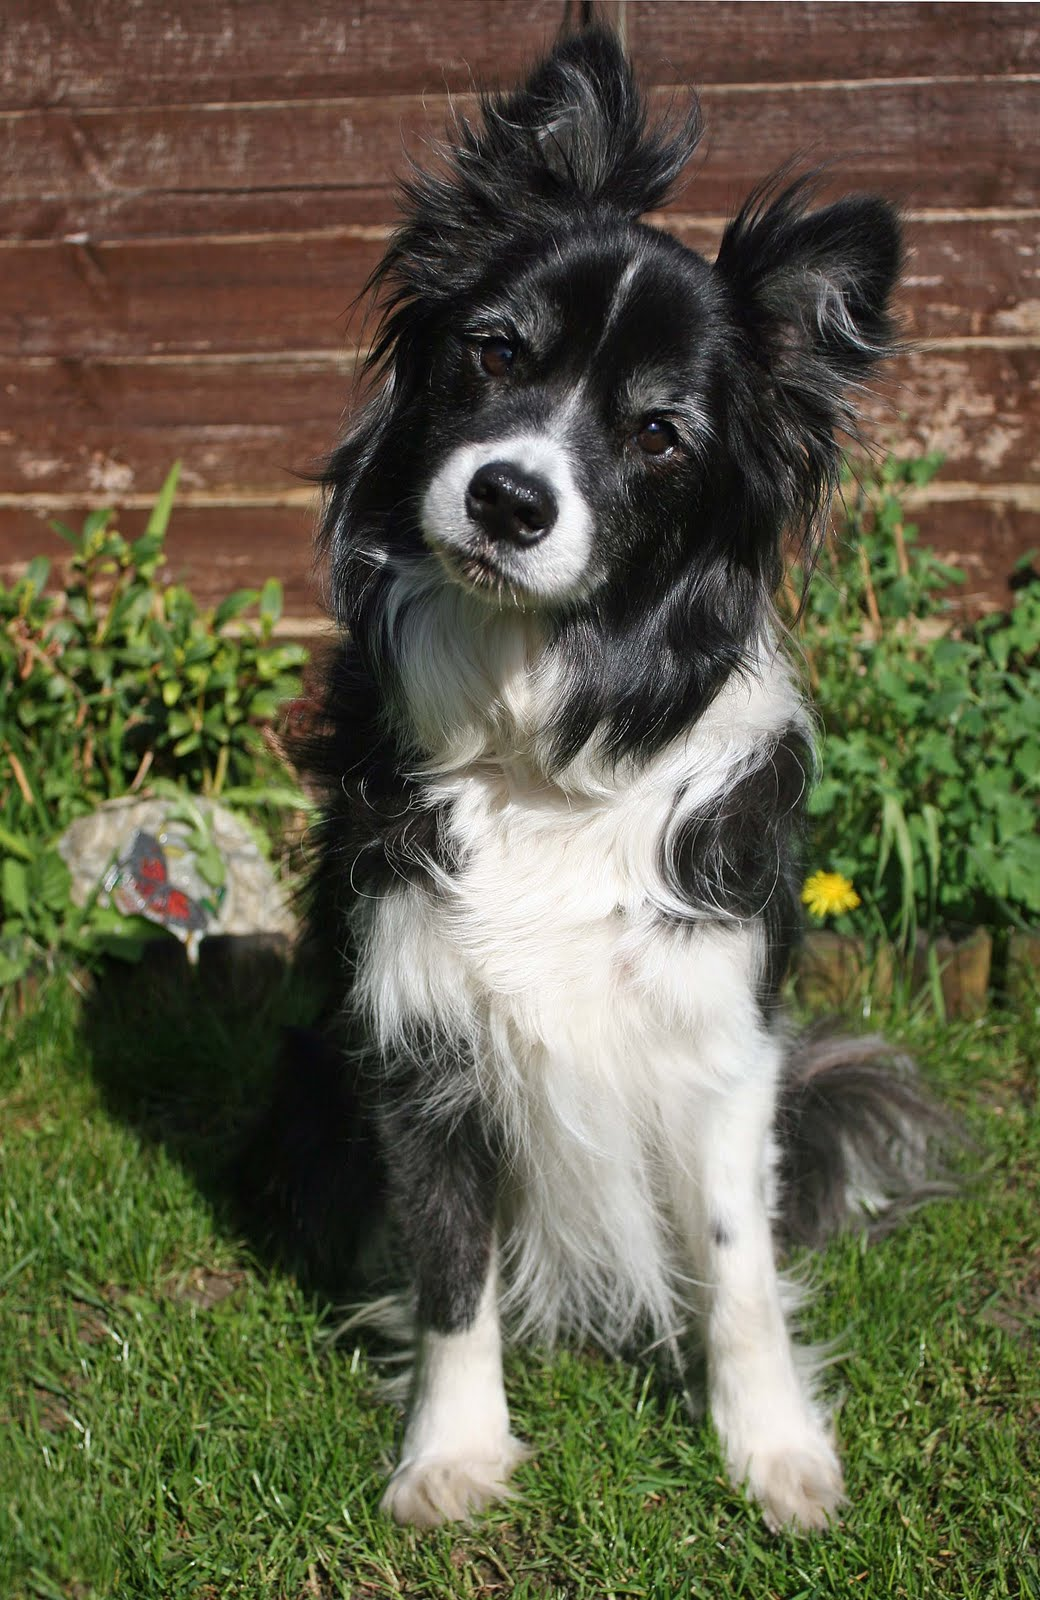 English Shepherd Dog: English Funny English Shepherd Dog Breed